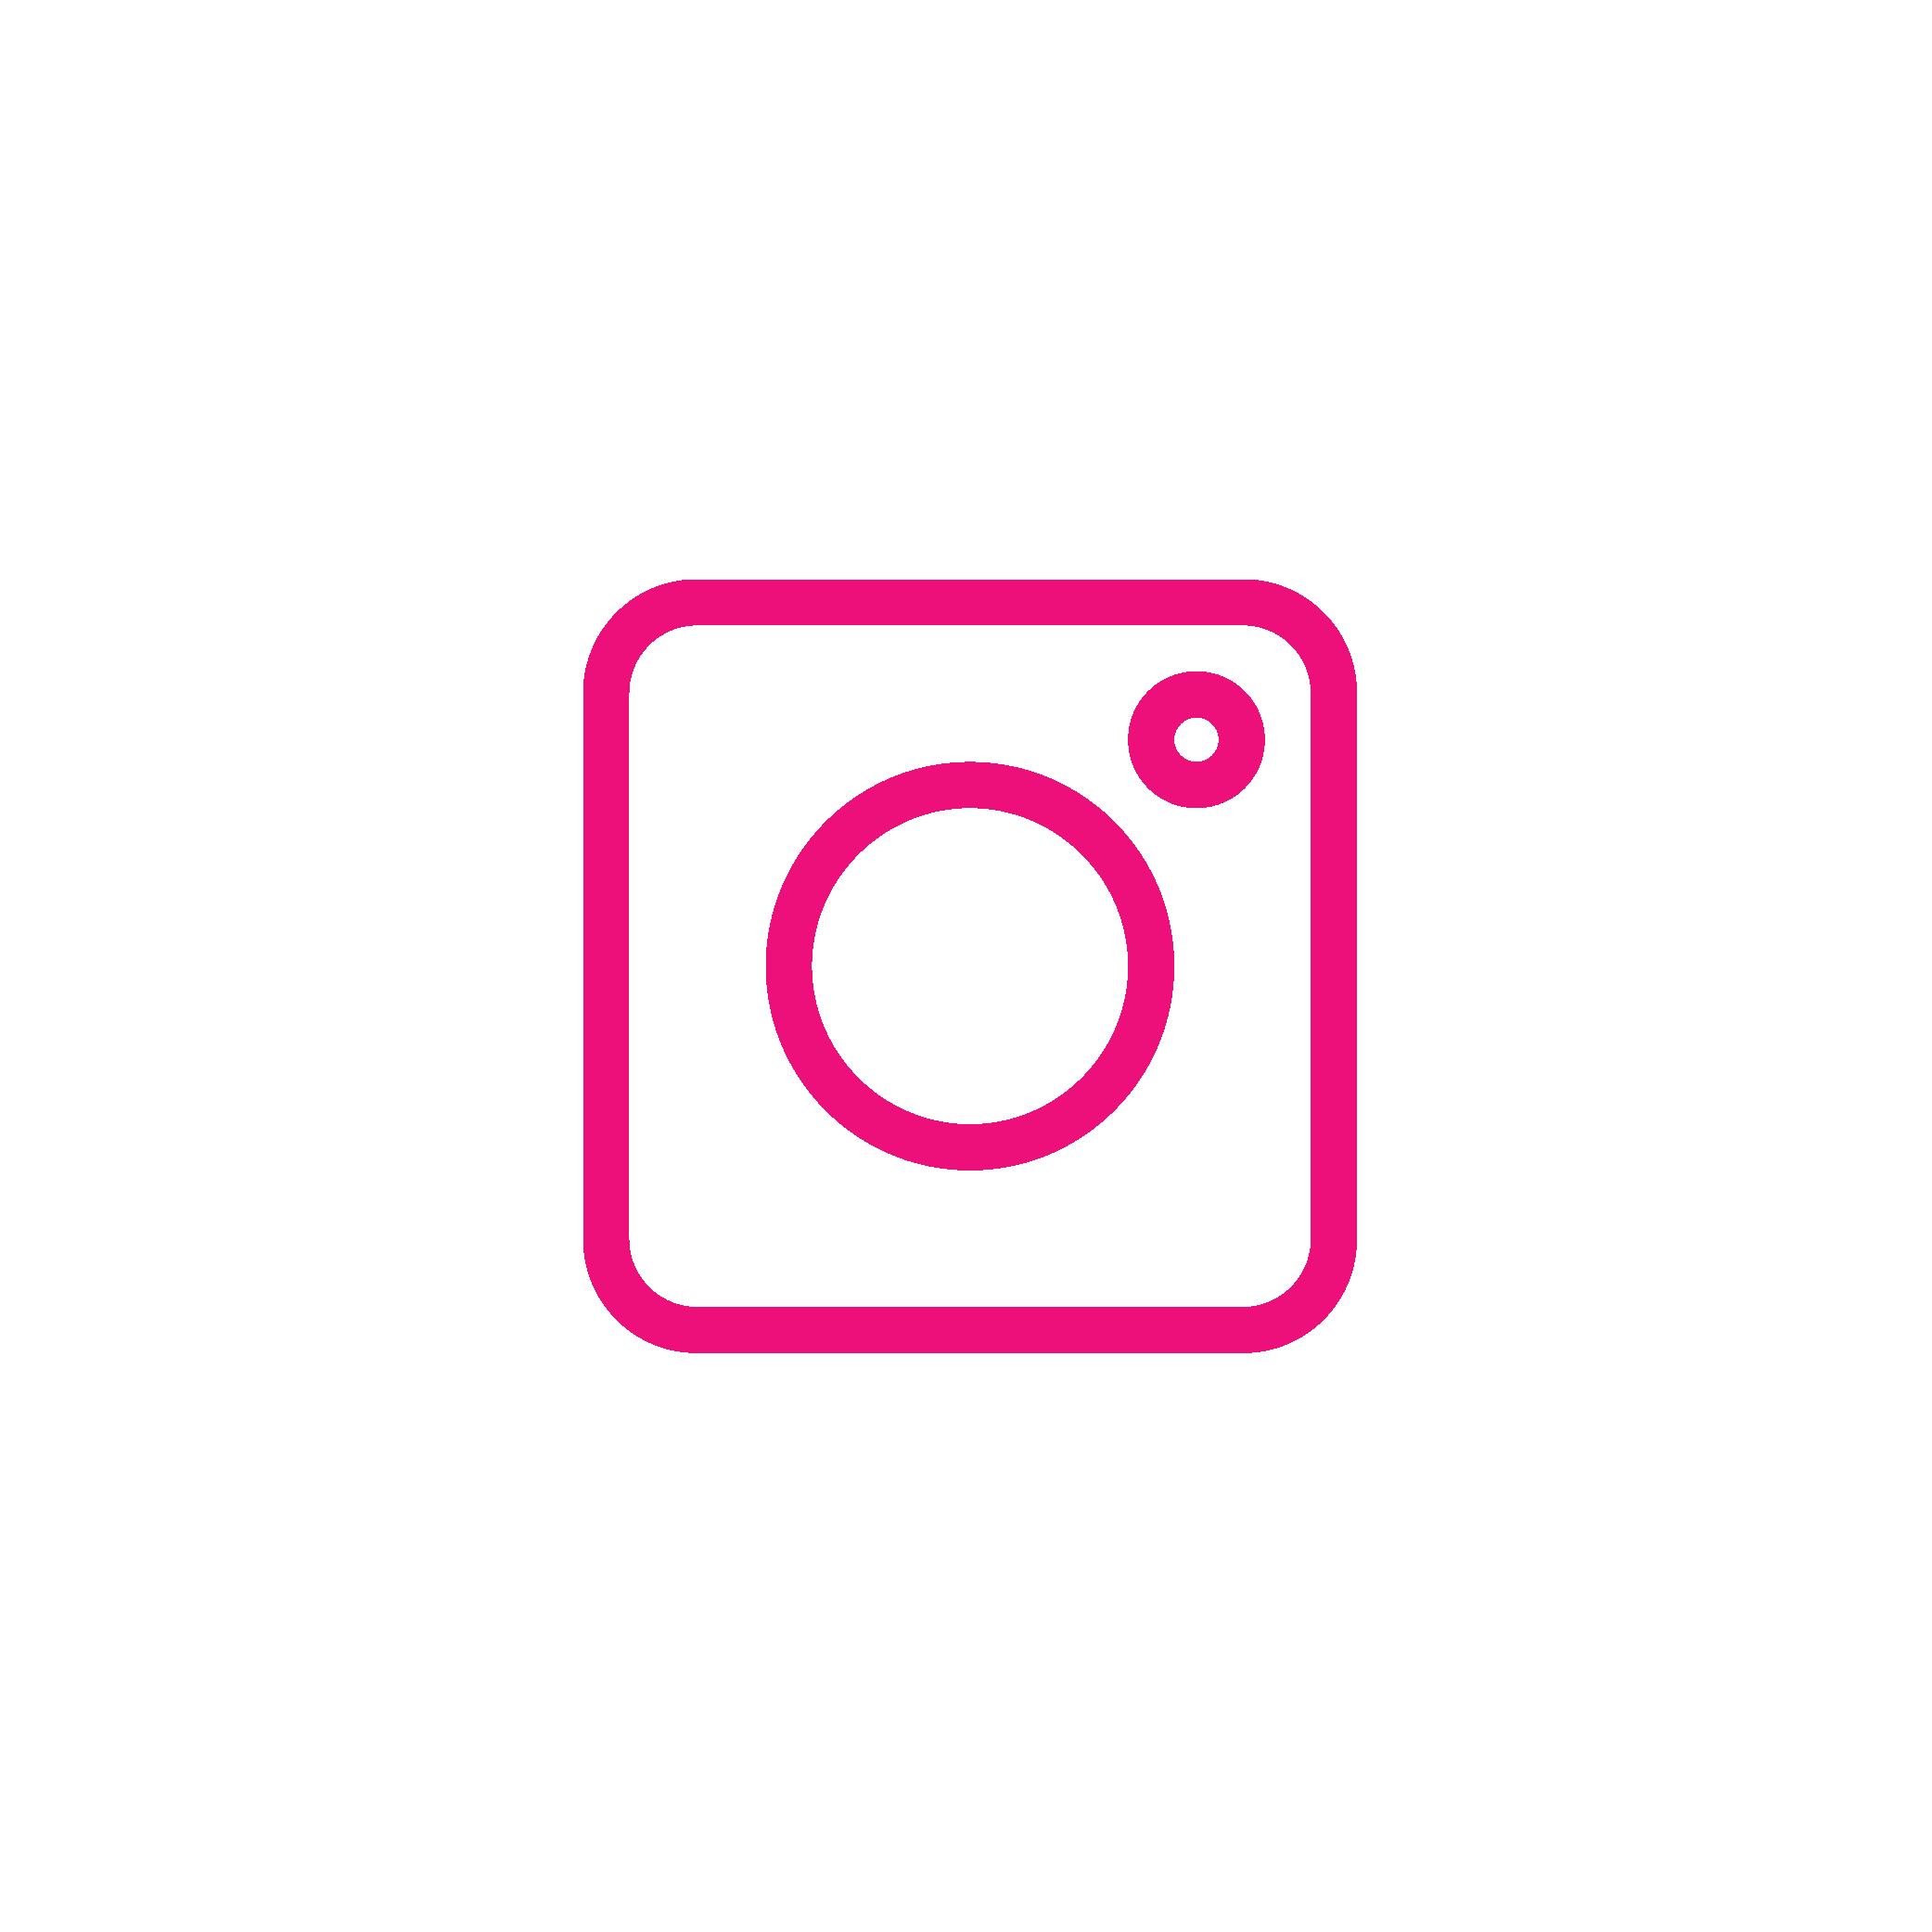 1M4_Instagram-04.png